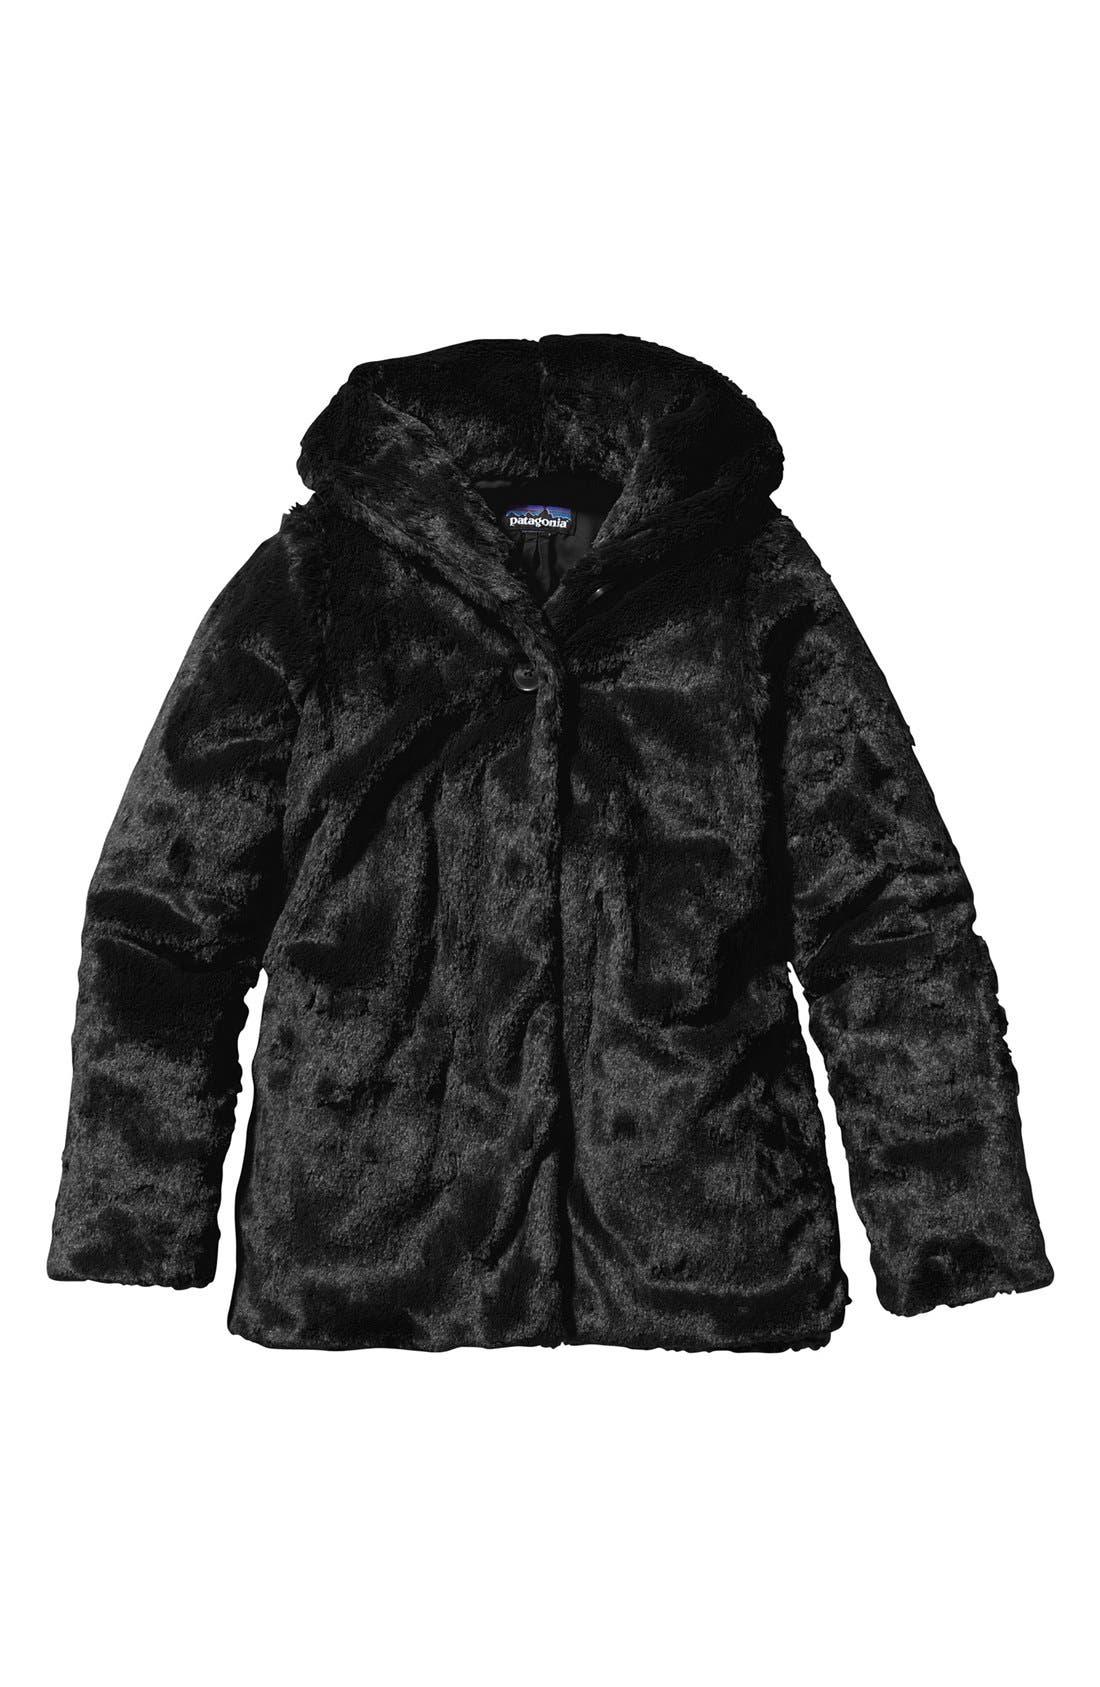 'Pelage' Jacket,                             Main thumbnail 1, color,                             001